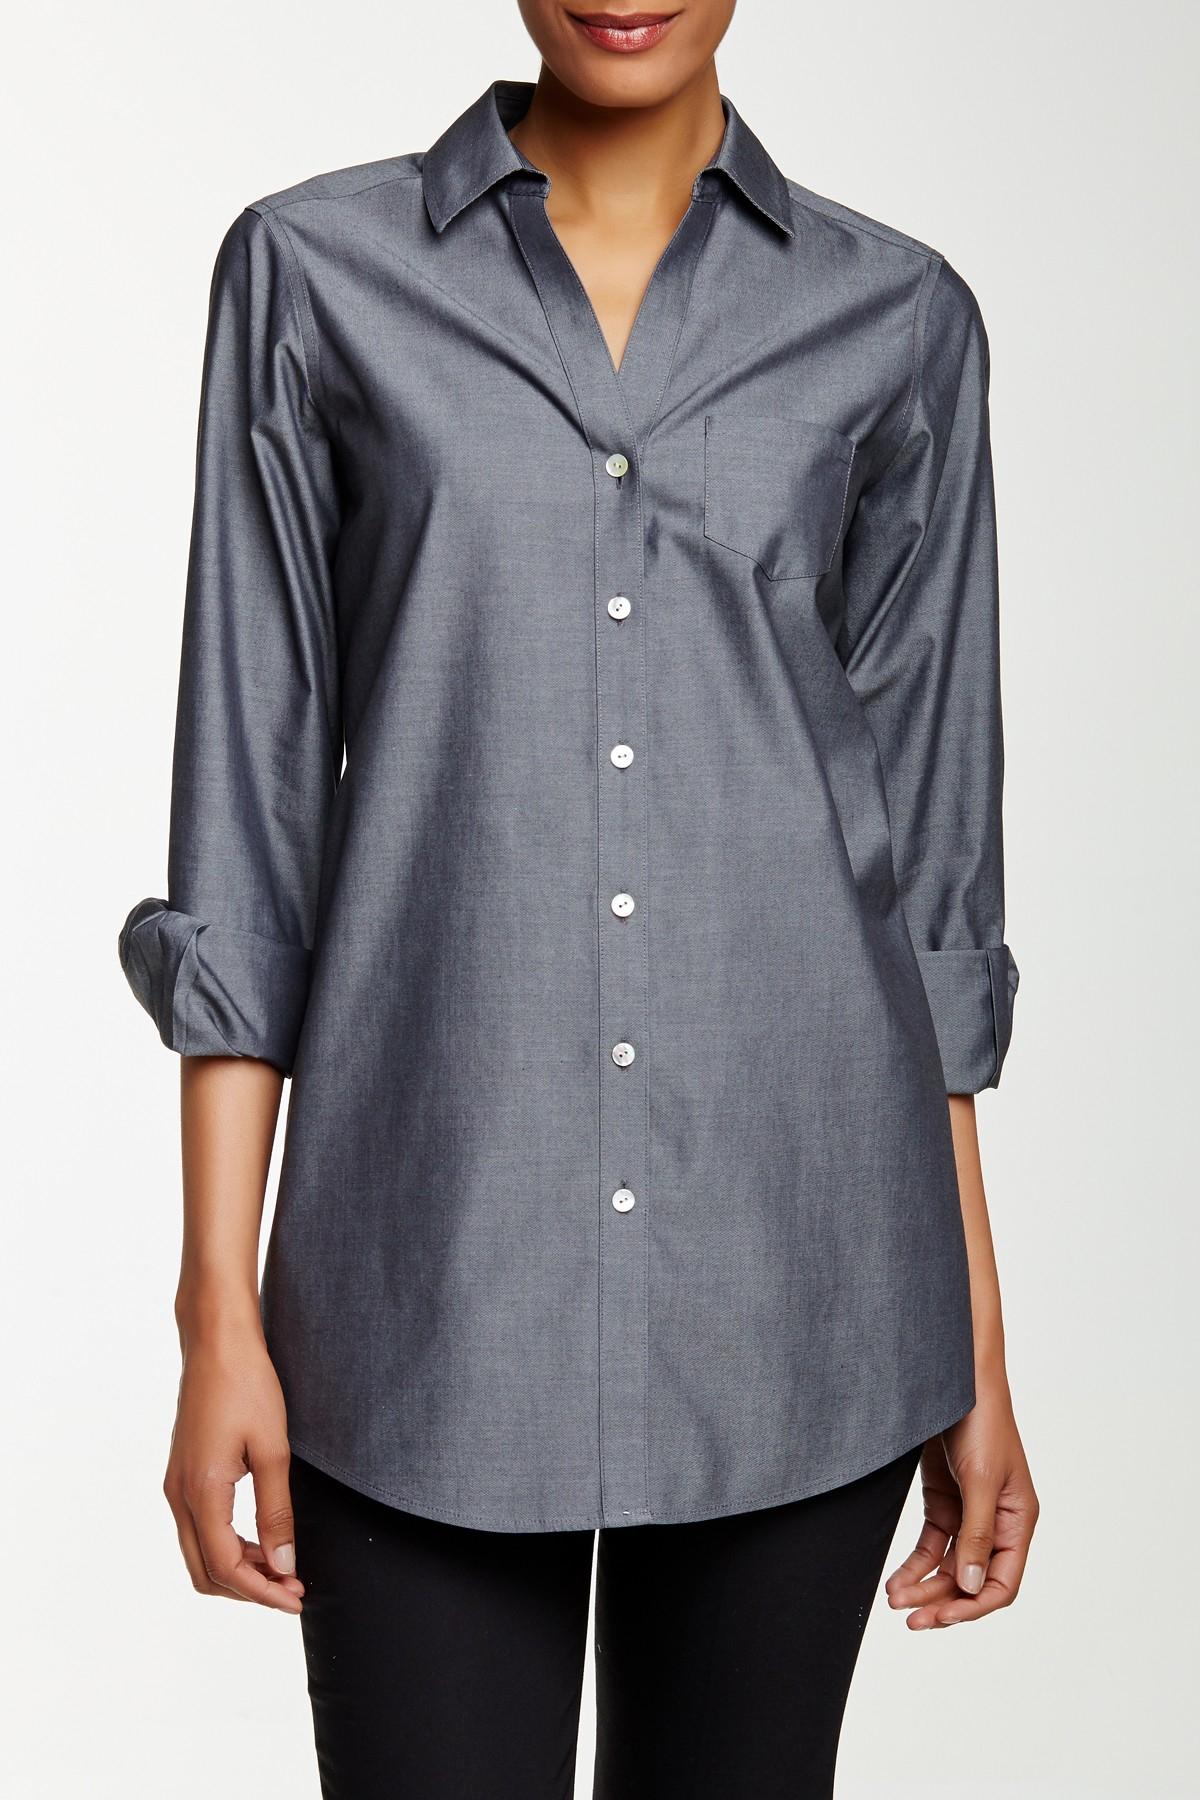 Lyst Foxcroft Long Sleeve Shaped Fay Tunic In Gray